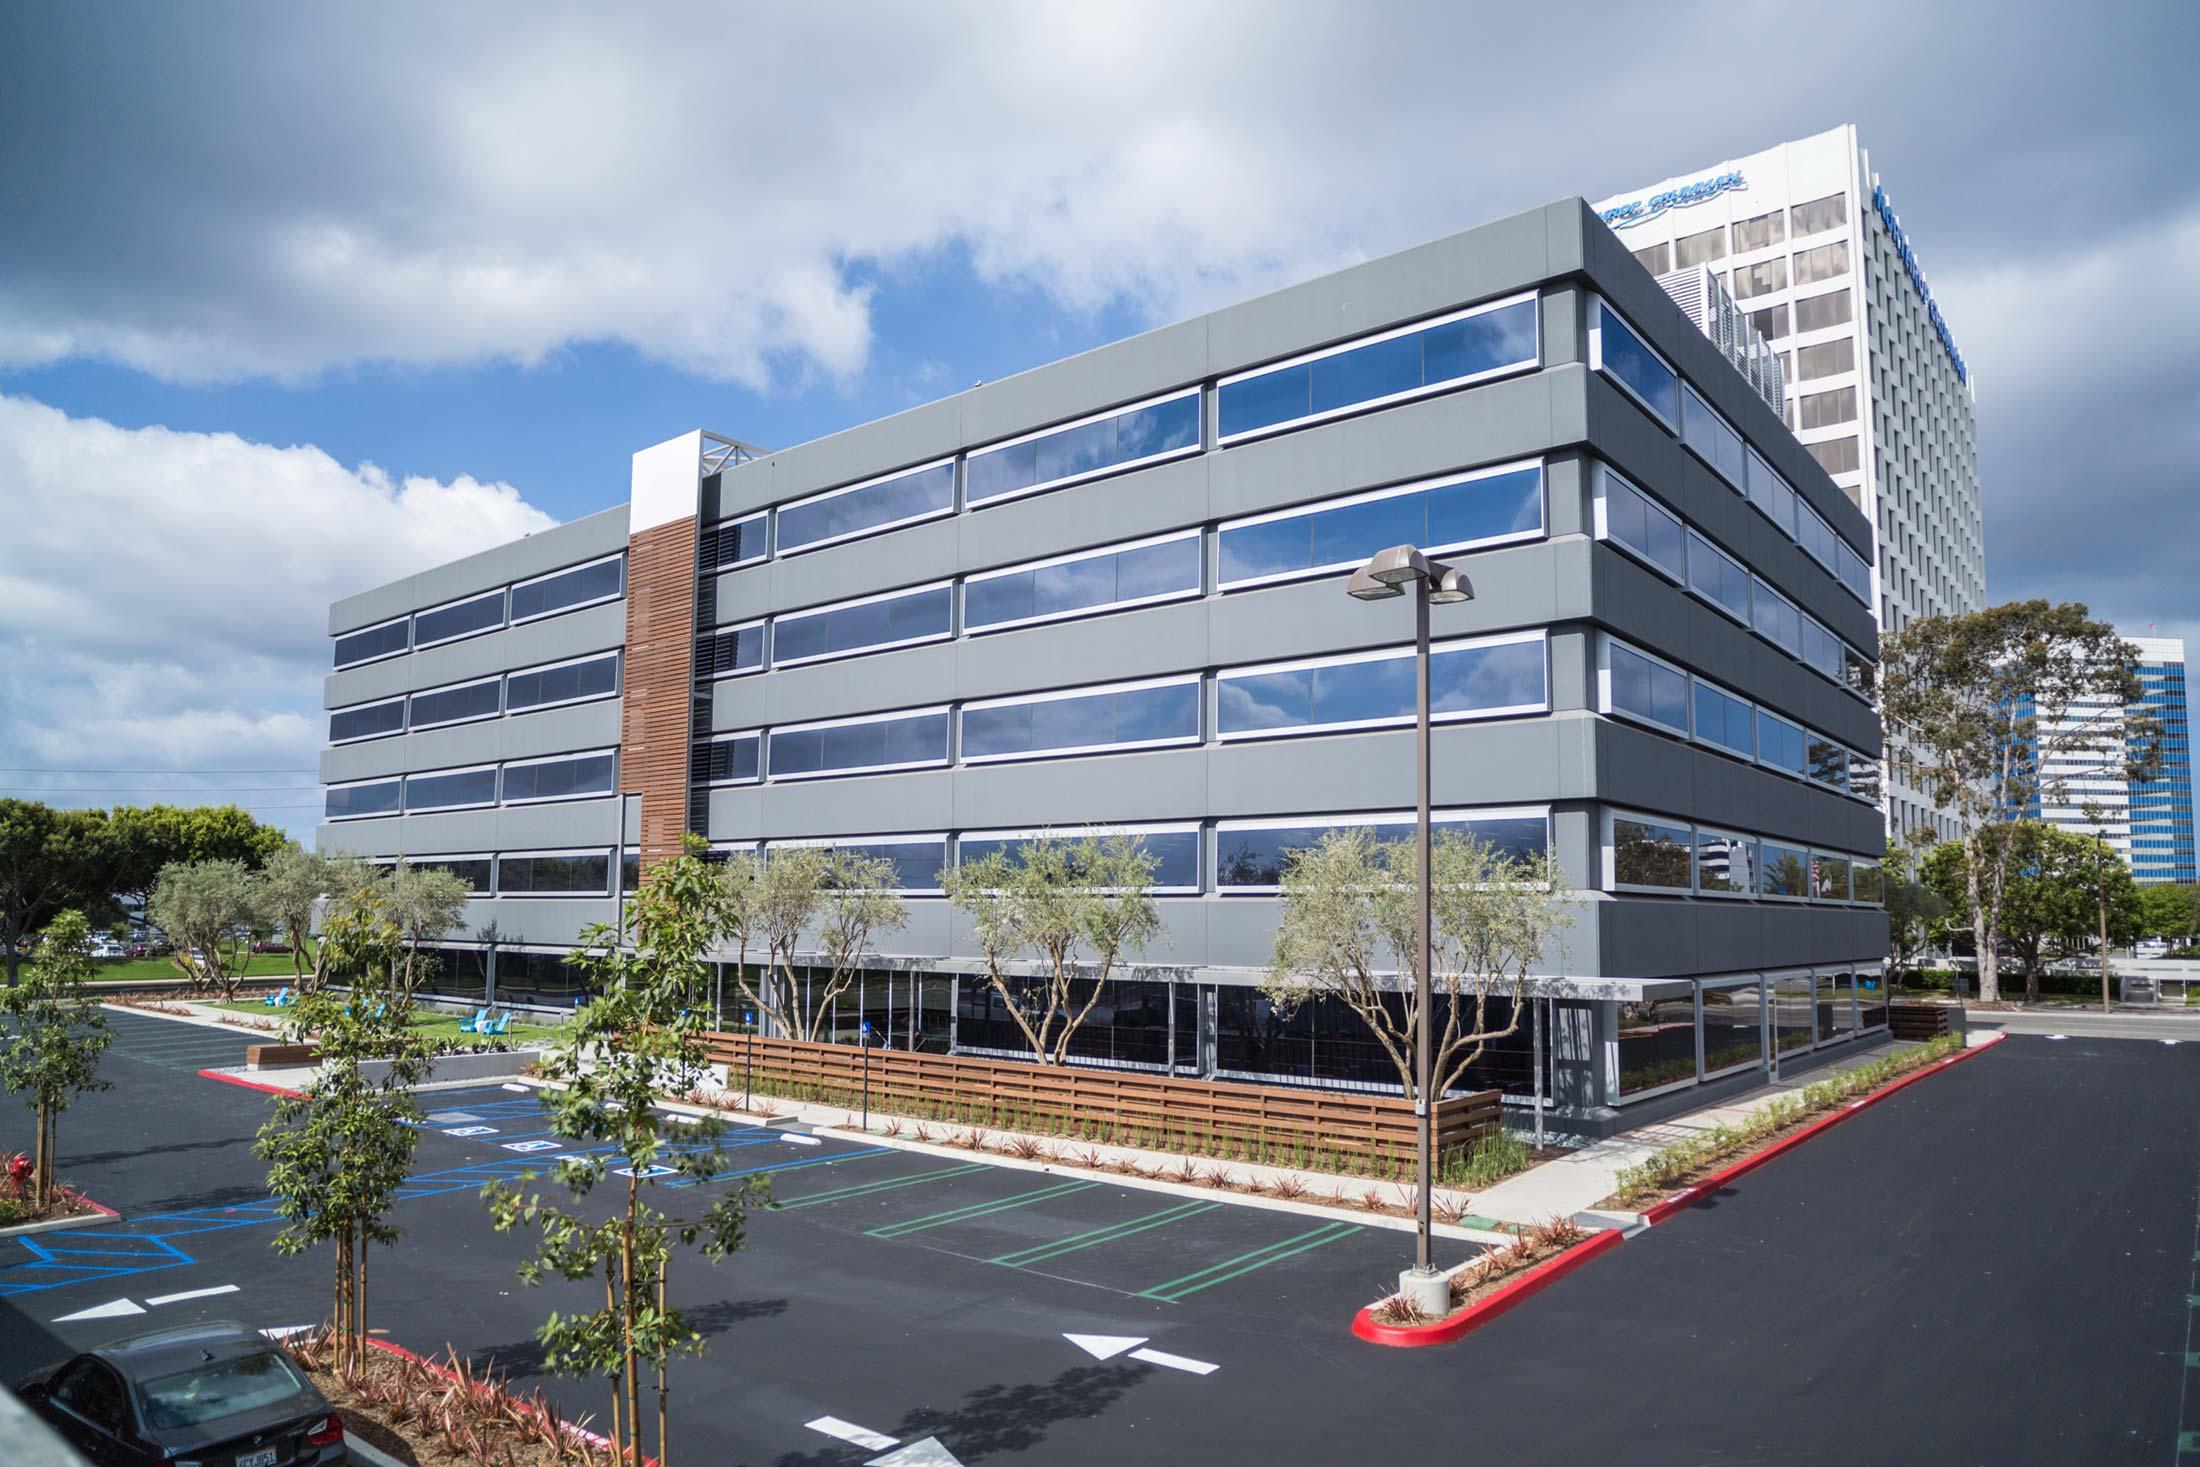 modern-architecture-building-commercial-california-shubindonaldson-2101elsegundo-01